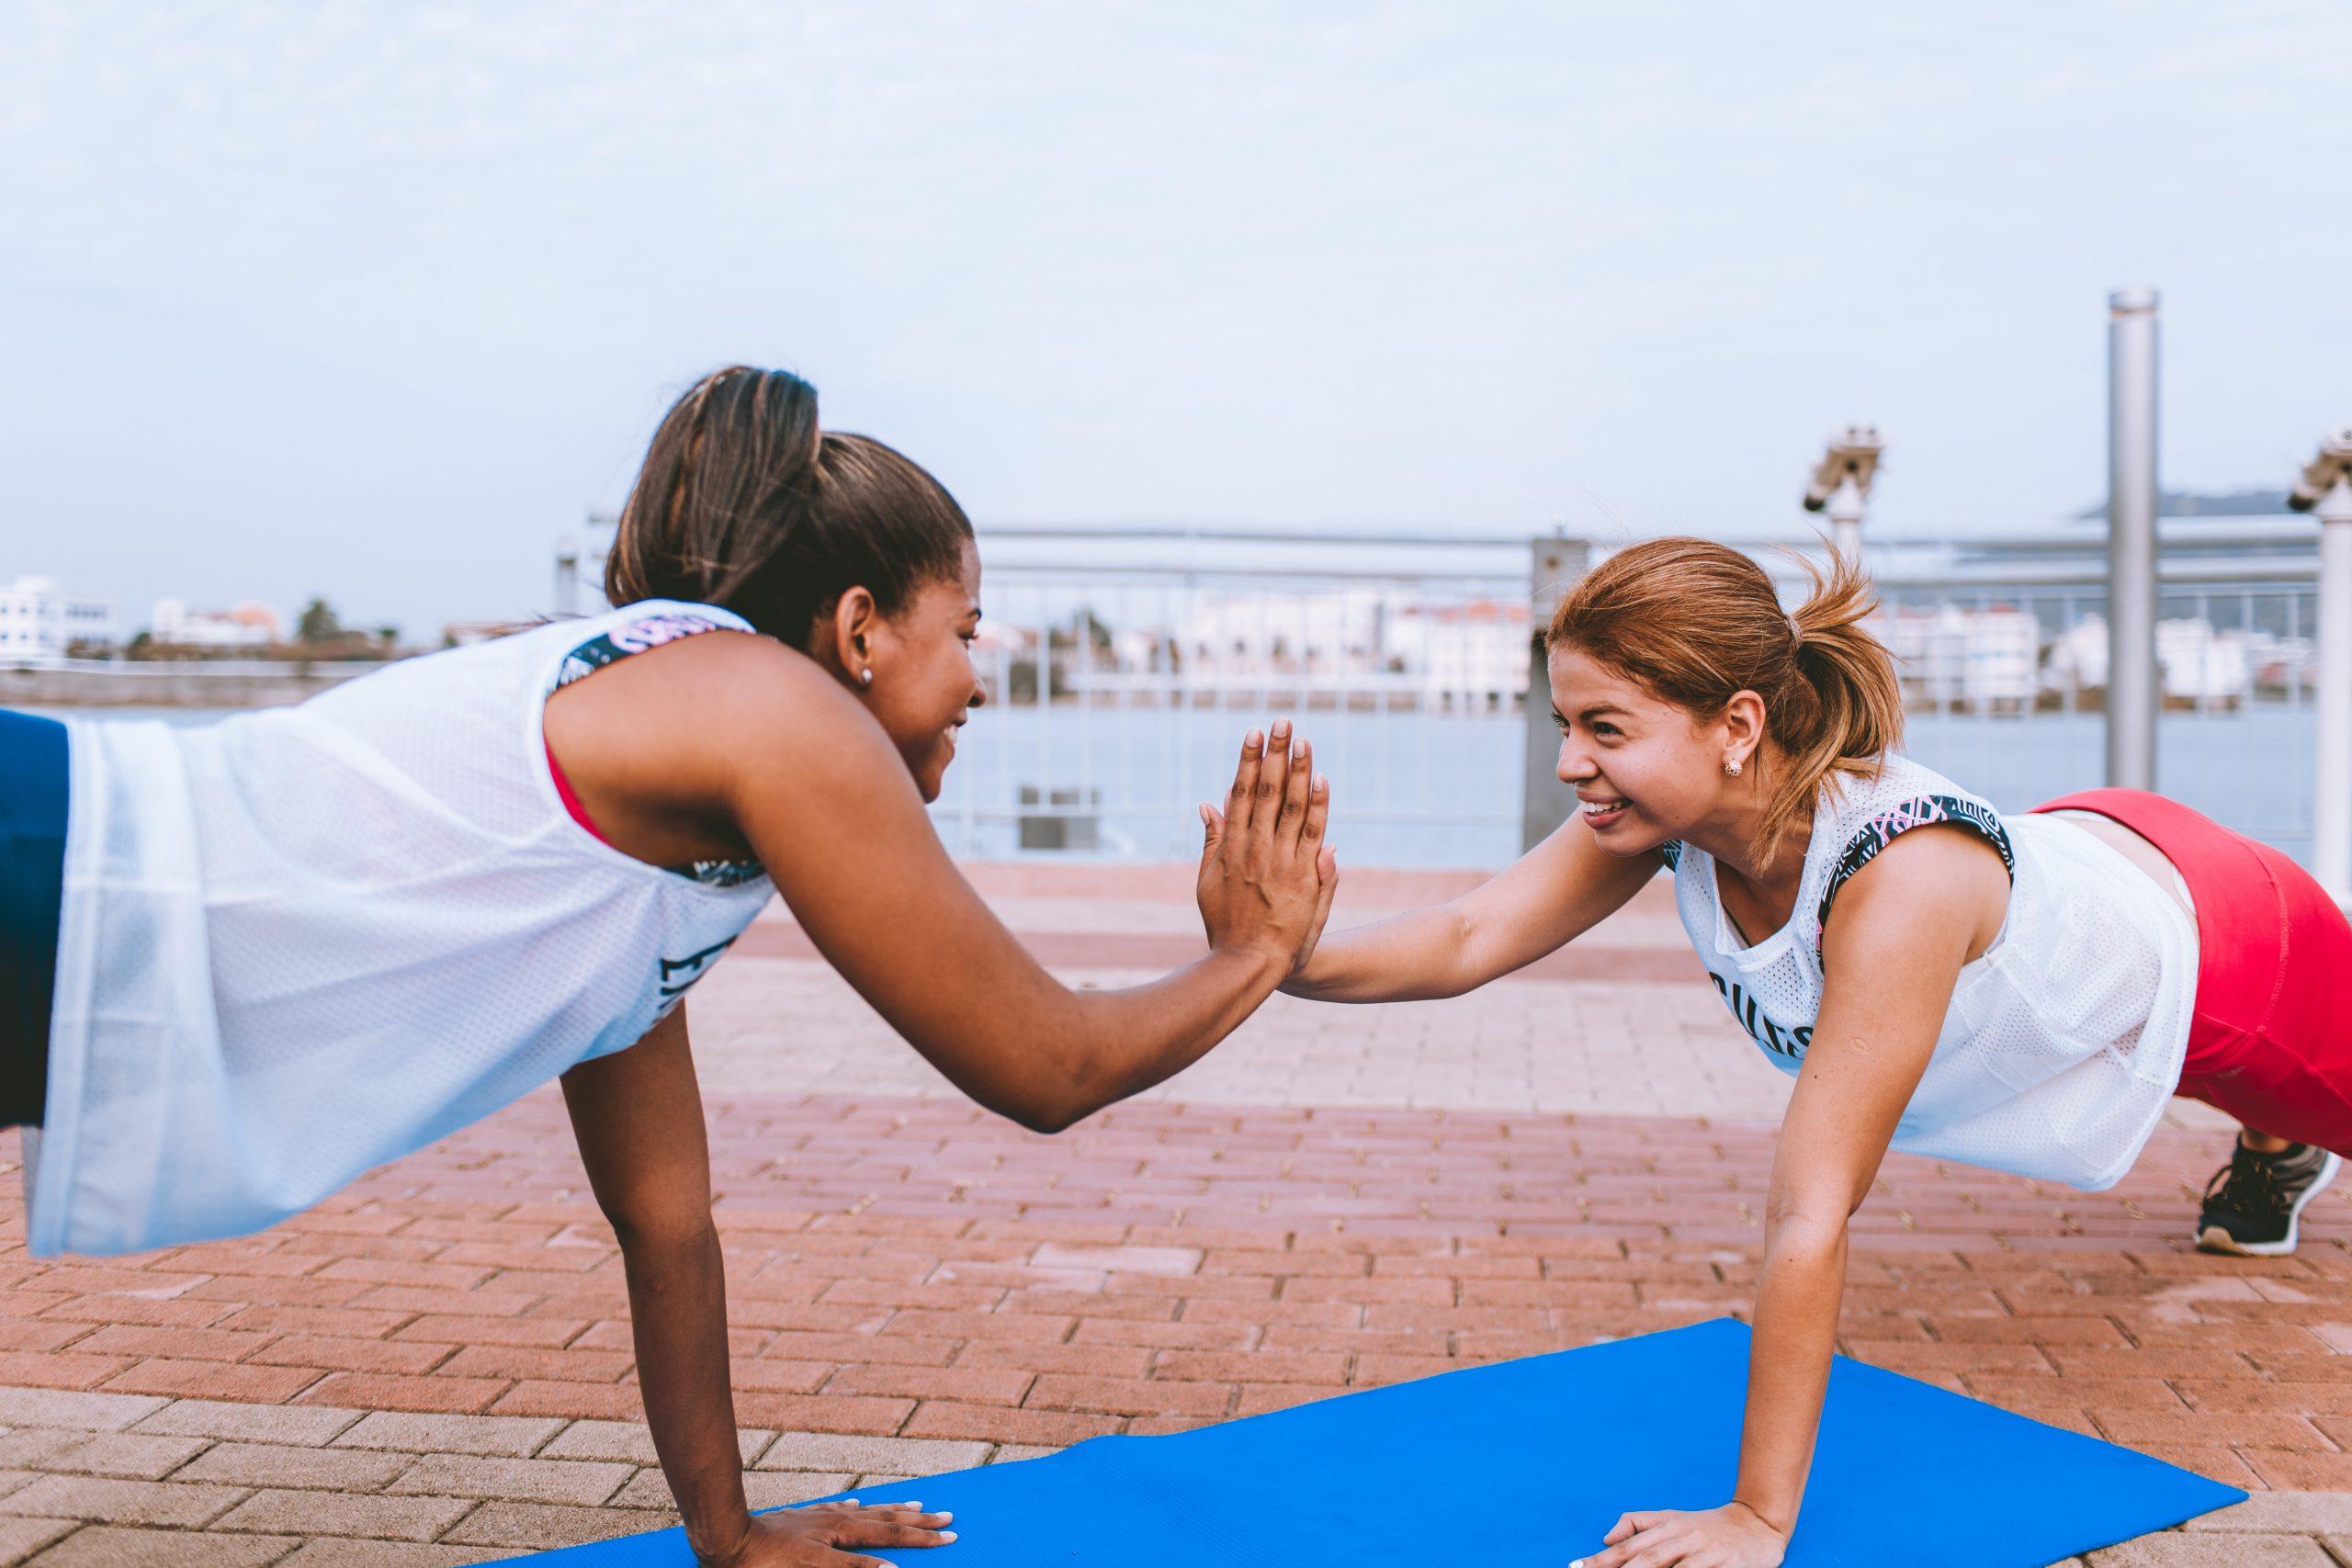 Gravidtræning, fysisk aktivitet under graviditeten